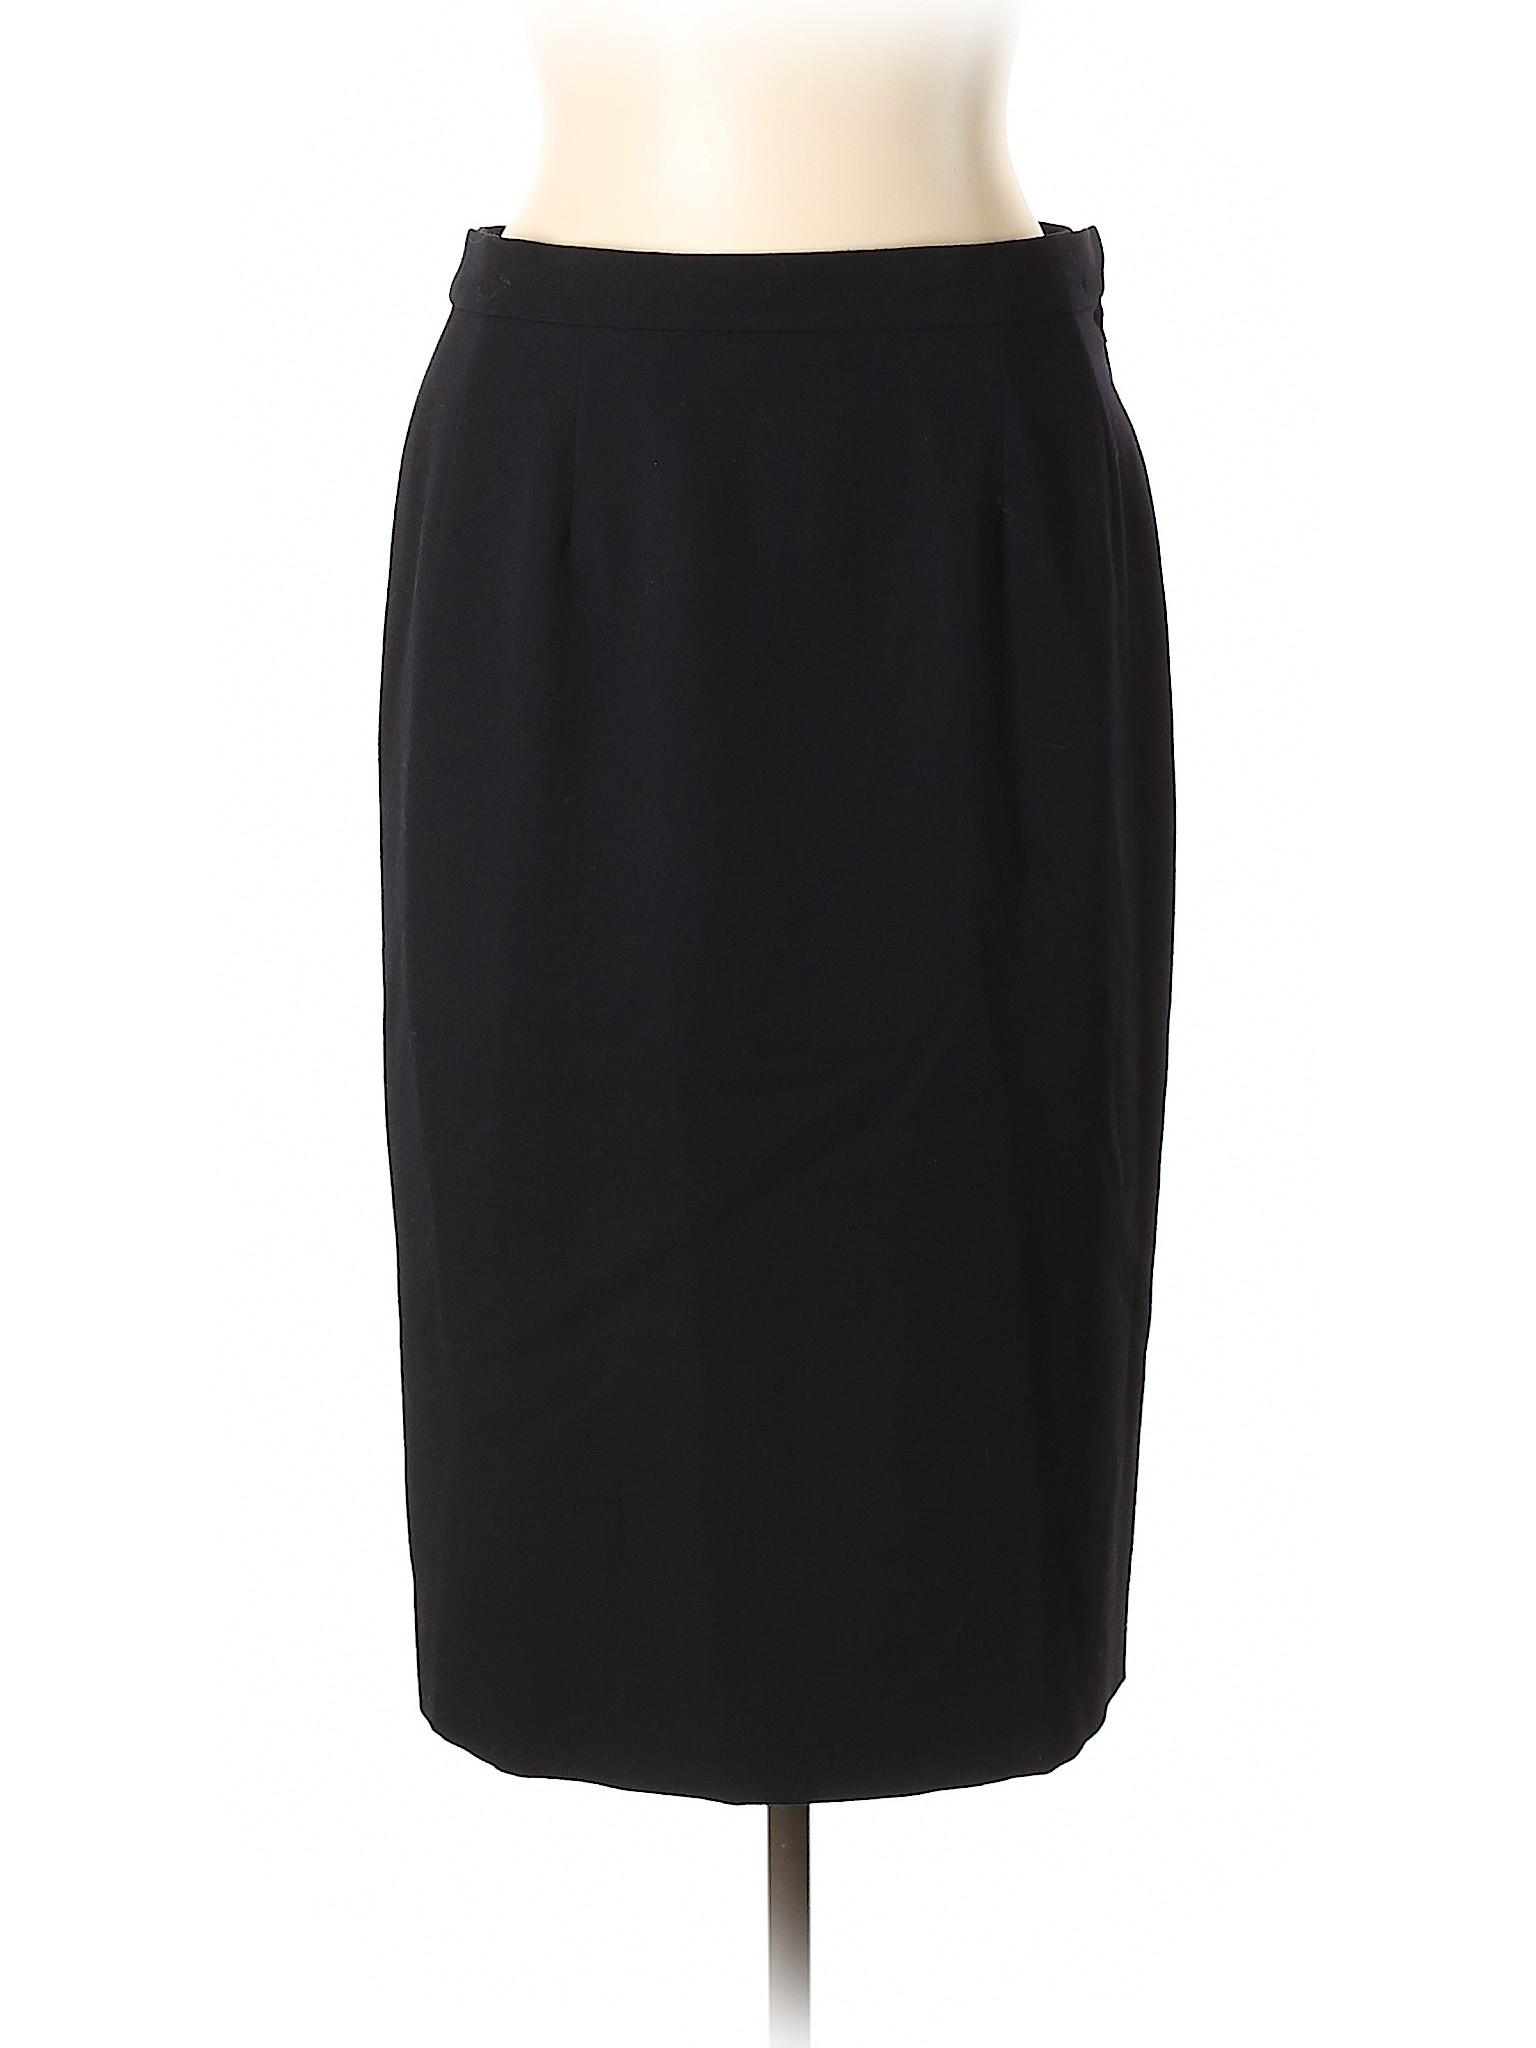 Skirt Wool Boutique Wool Boutique Boutique Skirt Wool IHYqE